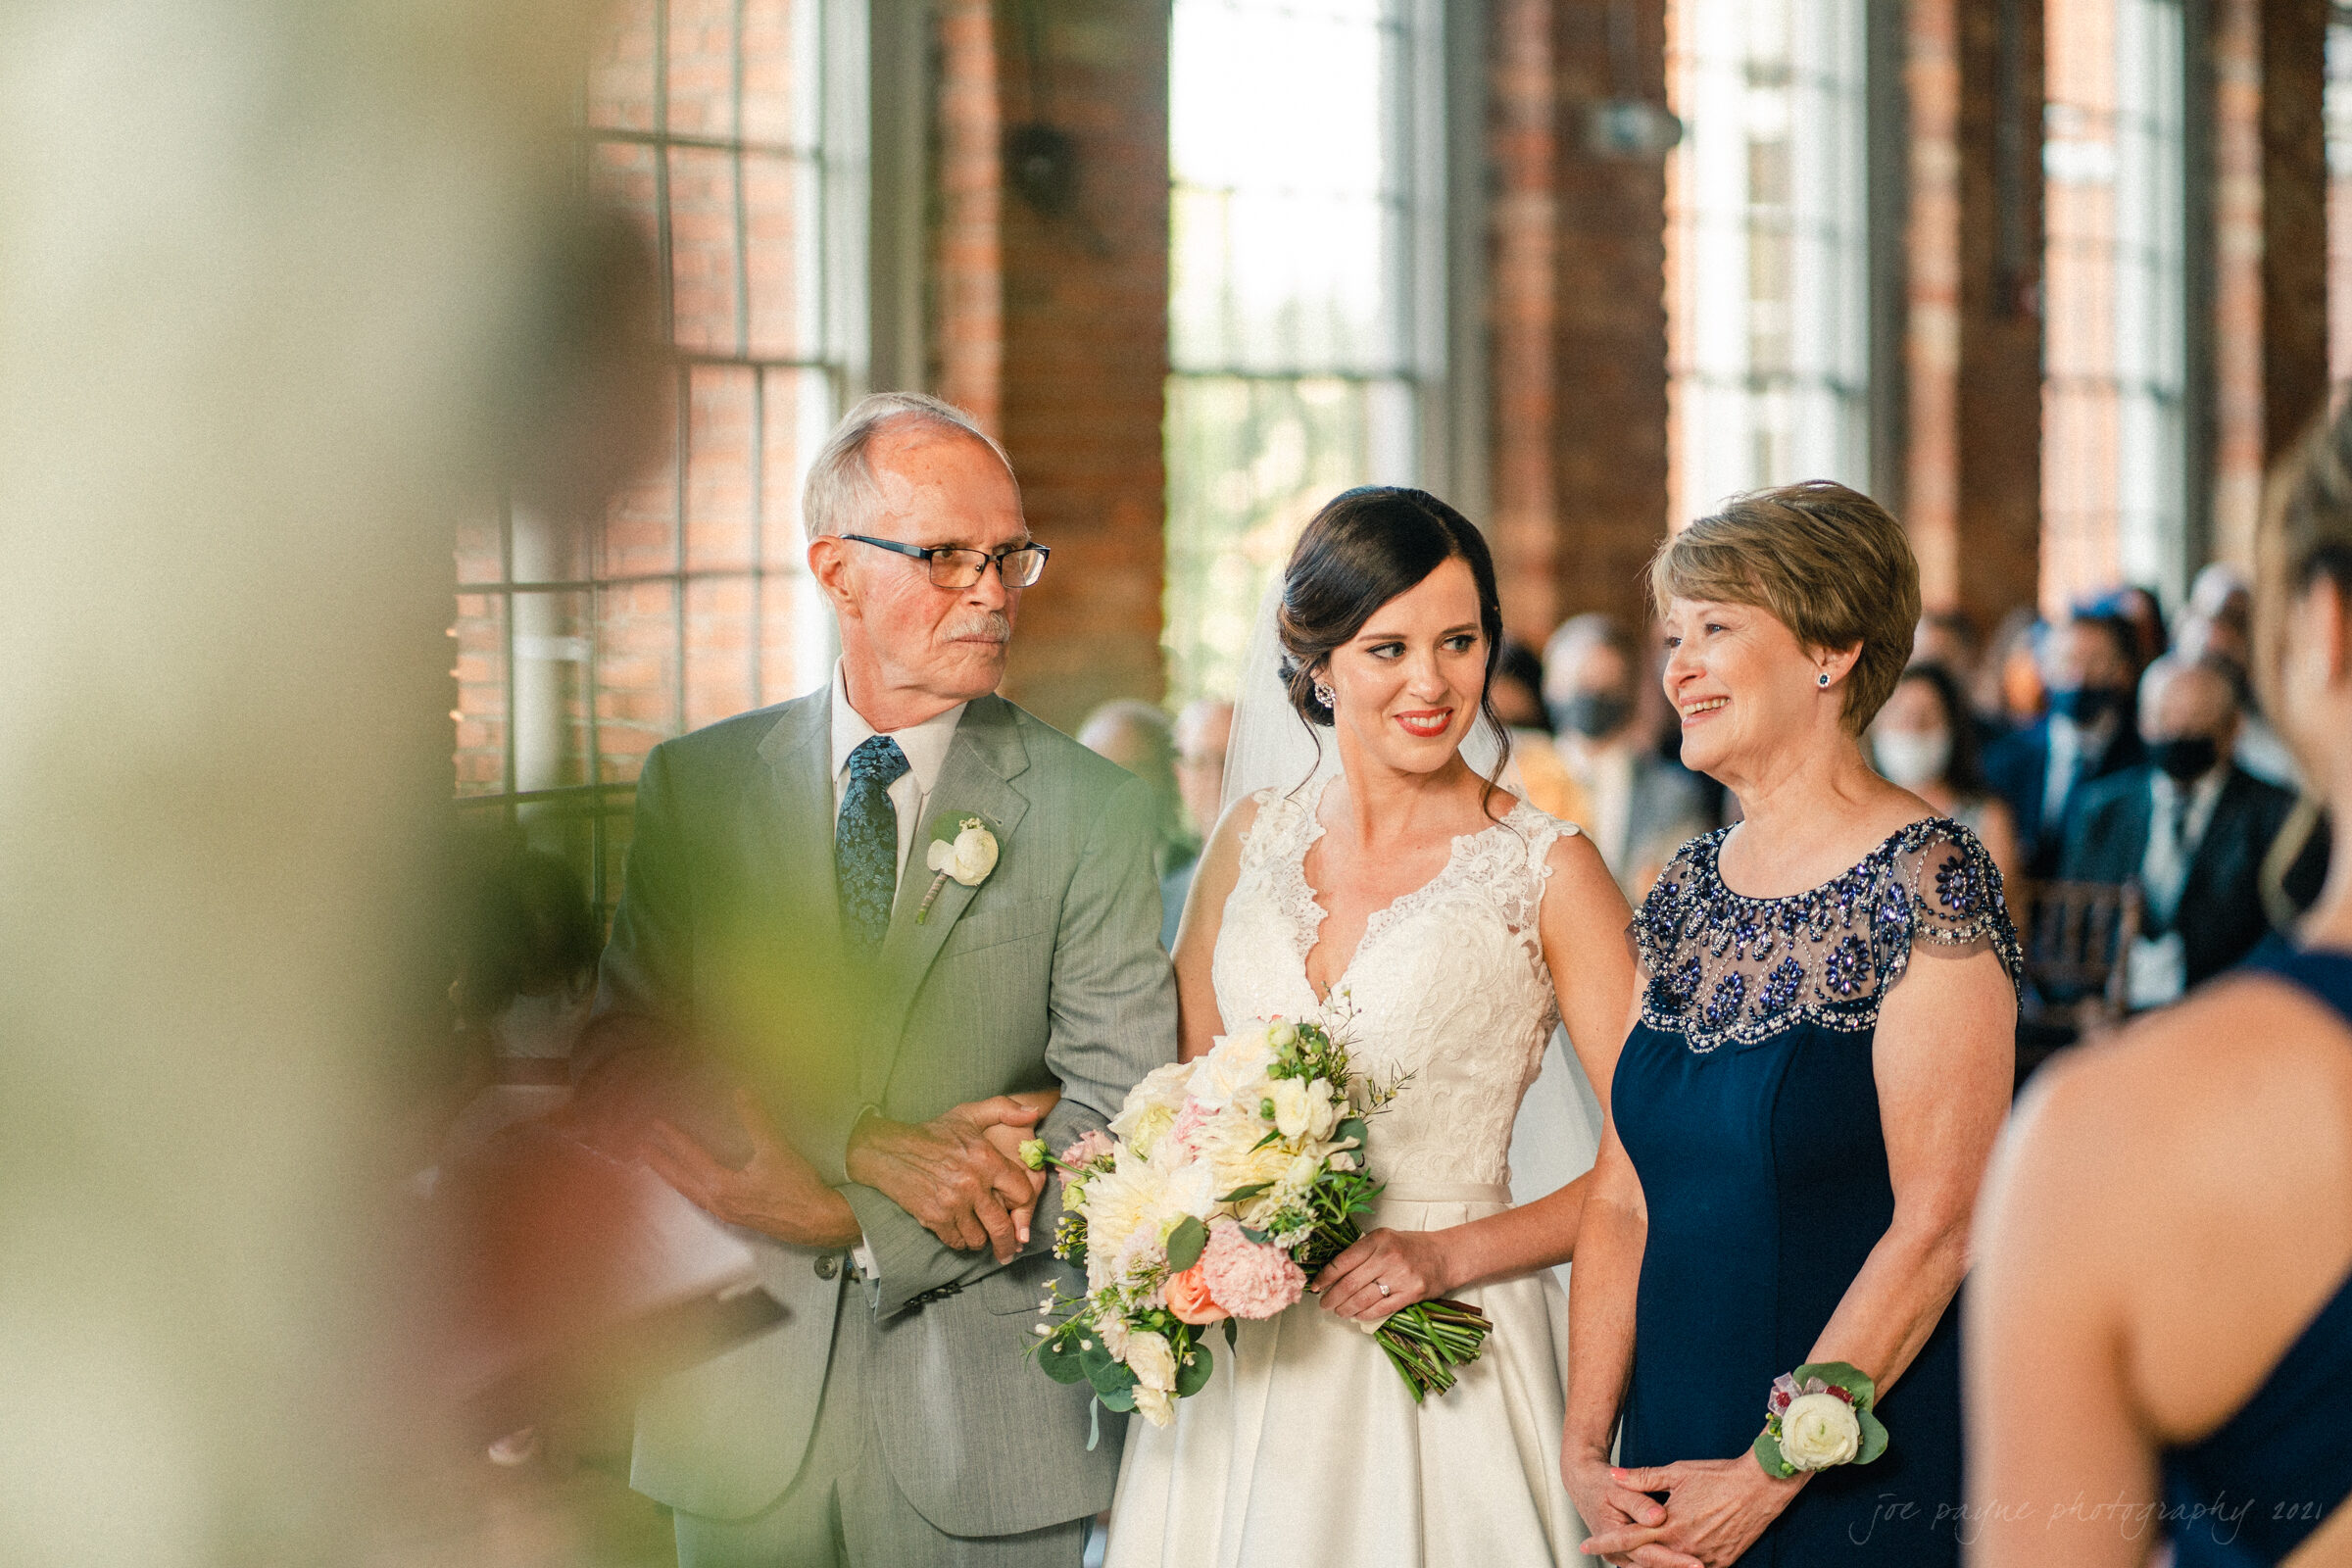 Cotton Room Wedding Photographer Kate Martin 26